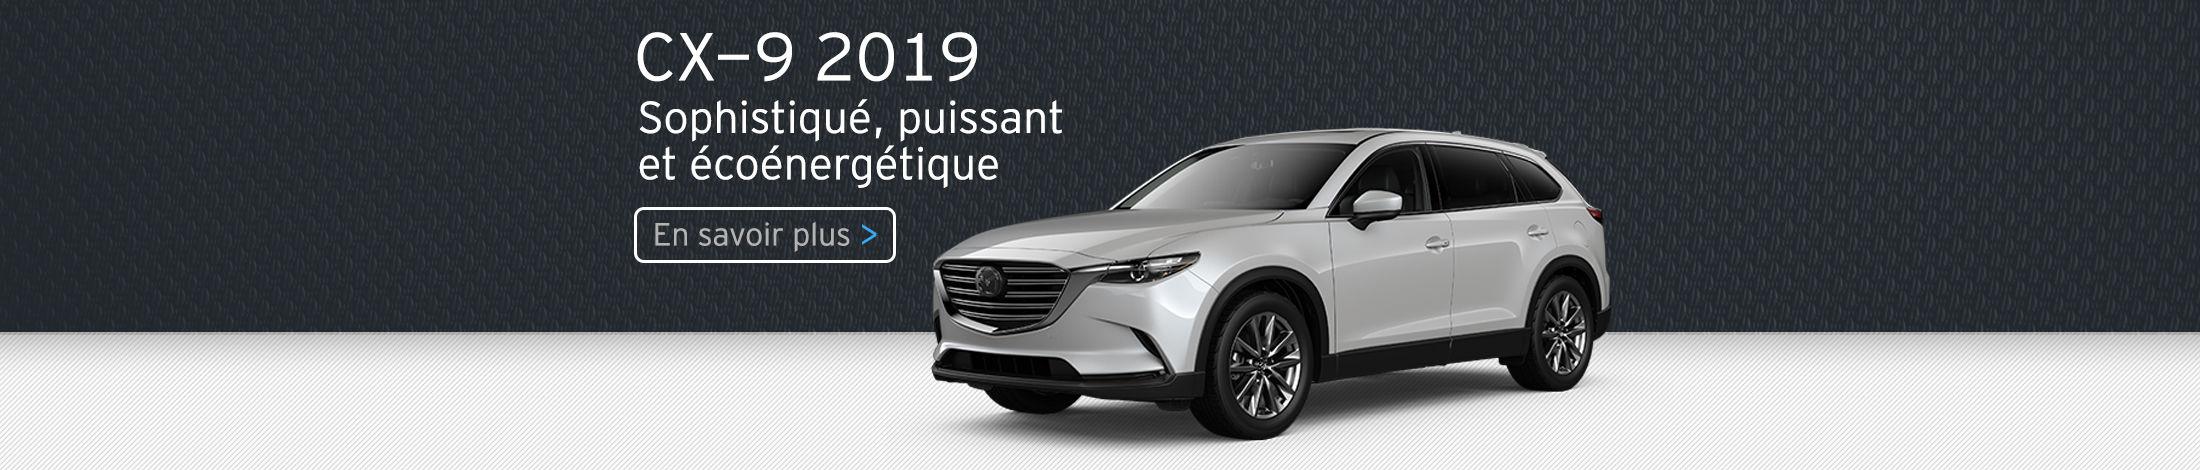 CX-9 2019